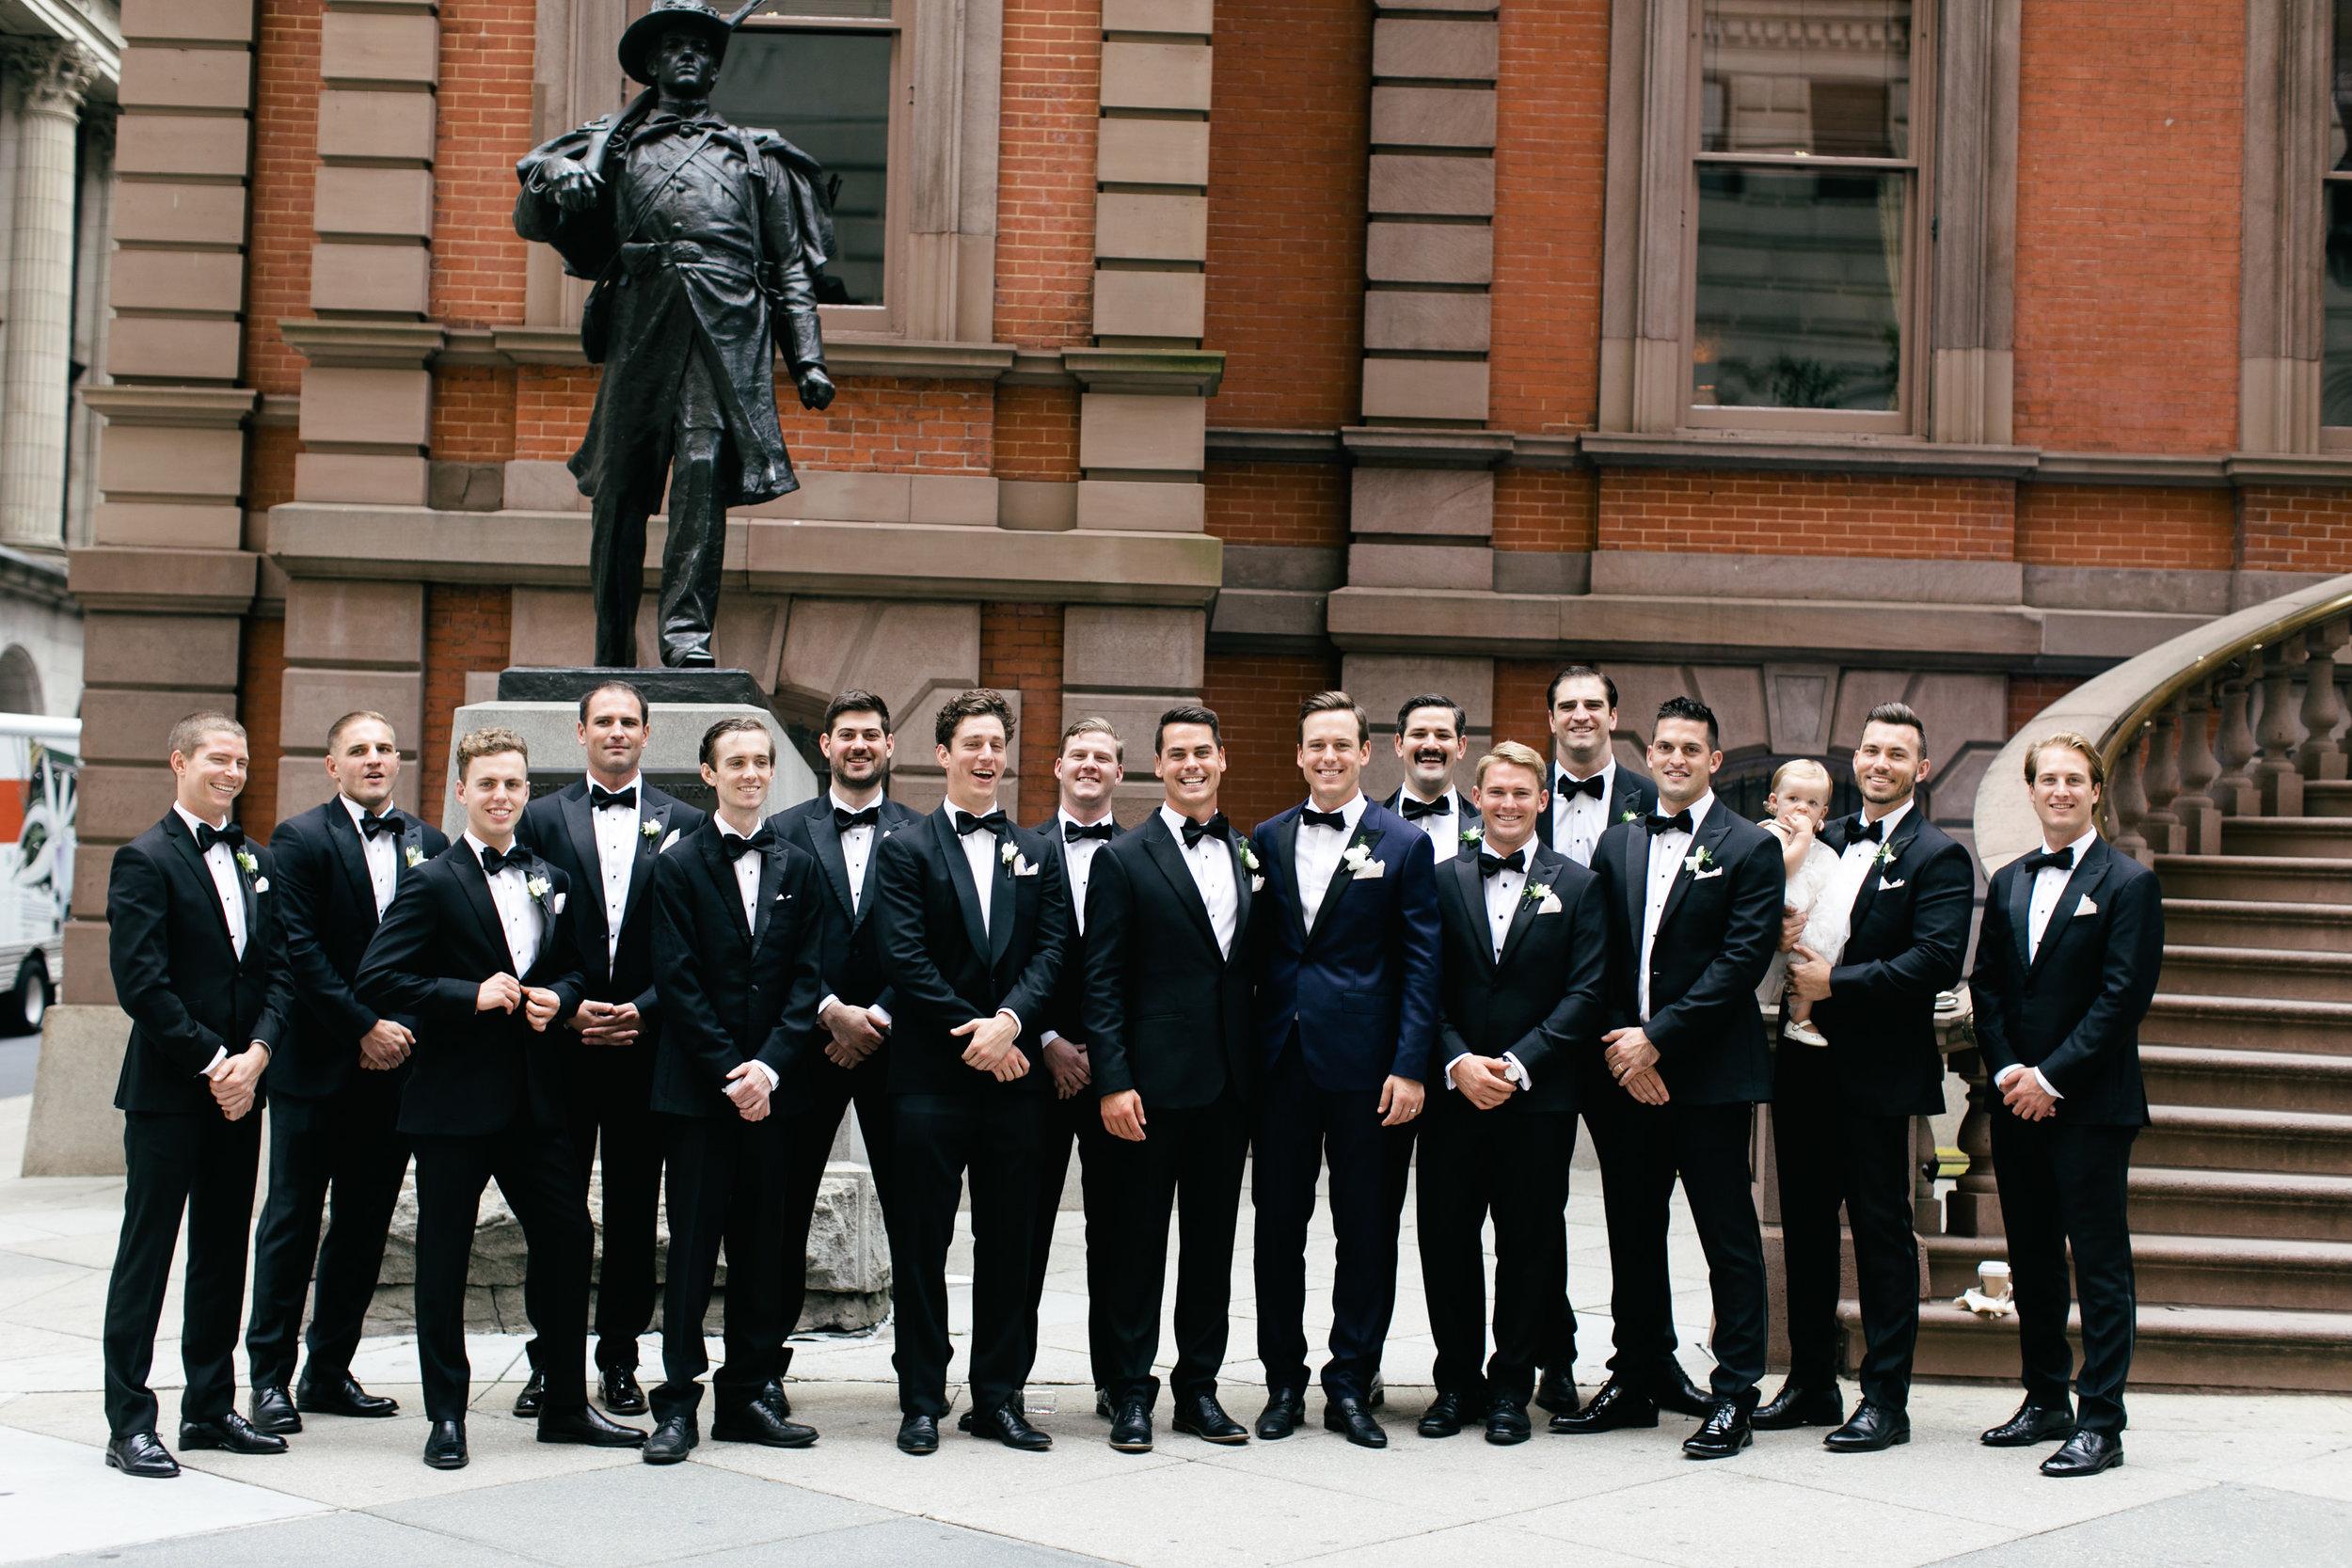 photography-wedding-weddings-natural-candid-union league-philadelphia-black tie-city hall-broad street-editorial-modern-fine-art-27.JPG